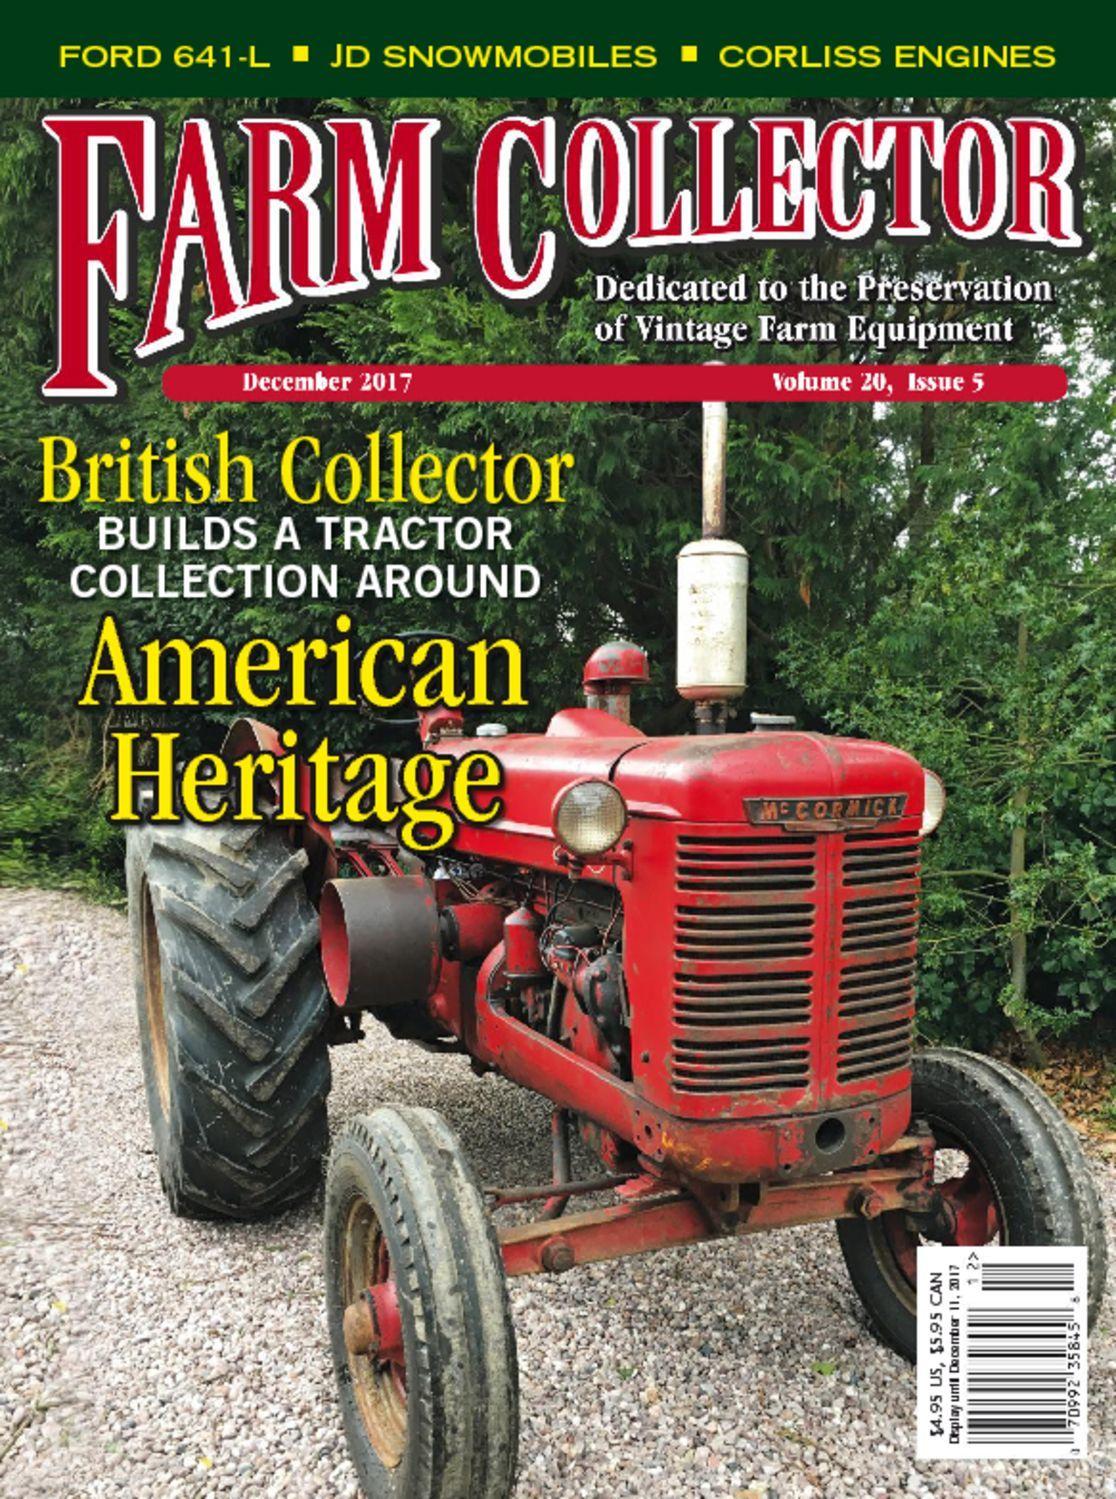 Farm Collector Digital